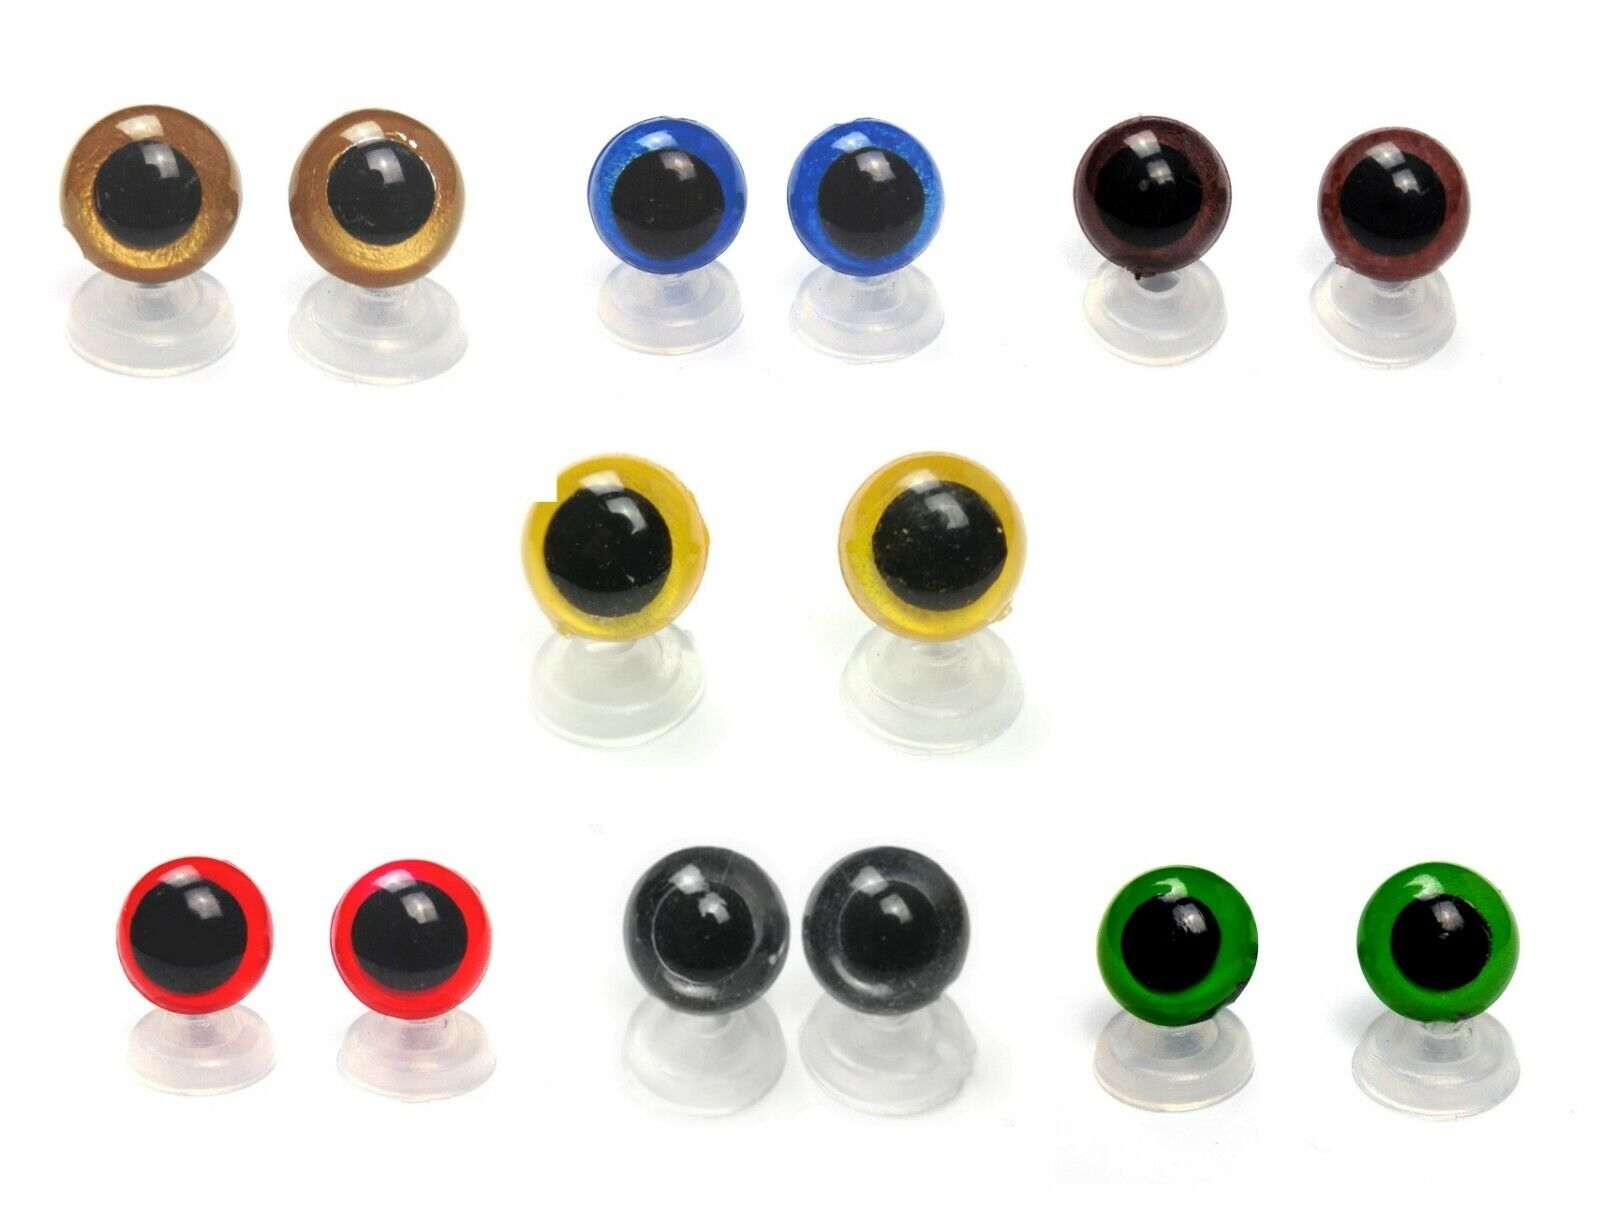 8-20 mm Plastic Safety Eyes Blue Green Red Brown Amber Amigurumi Toy Teddy Bear  - 2